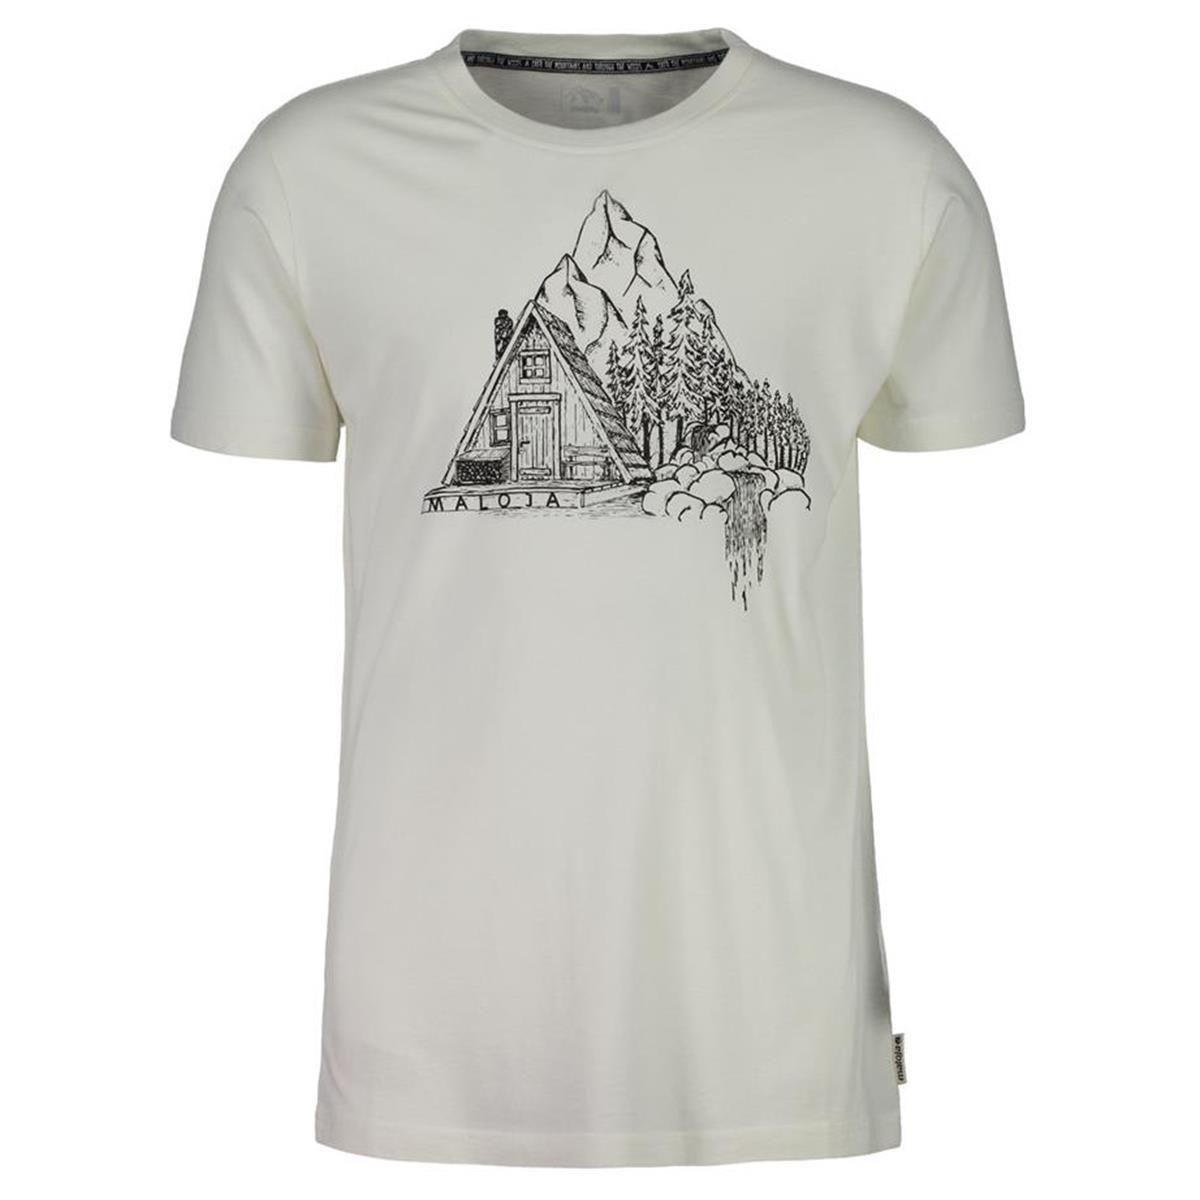 Maloja T-Shirt TarsousM. Vintage White